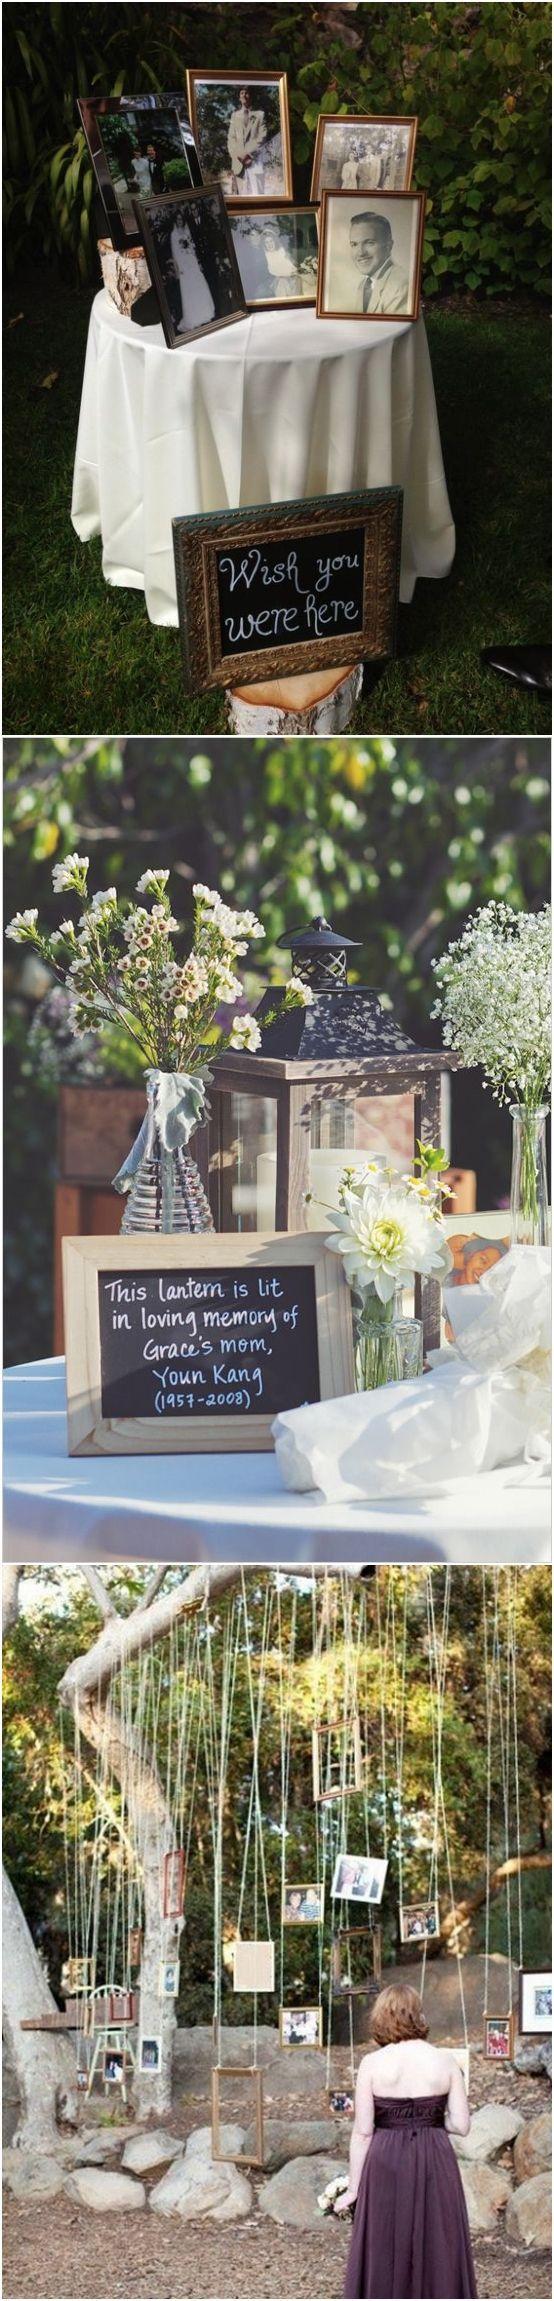 20 Unique Ways to Honor Deceased Loved Ones at Your Wedding #wedidngs #wedidngideas #wddingtips #weddingideas